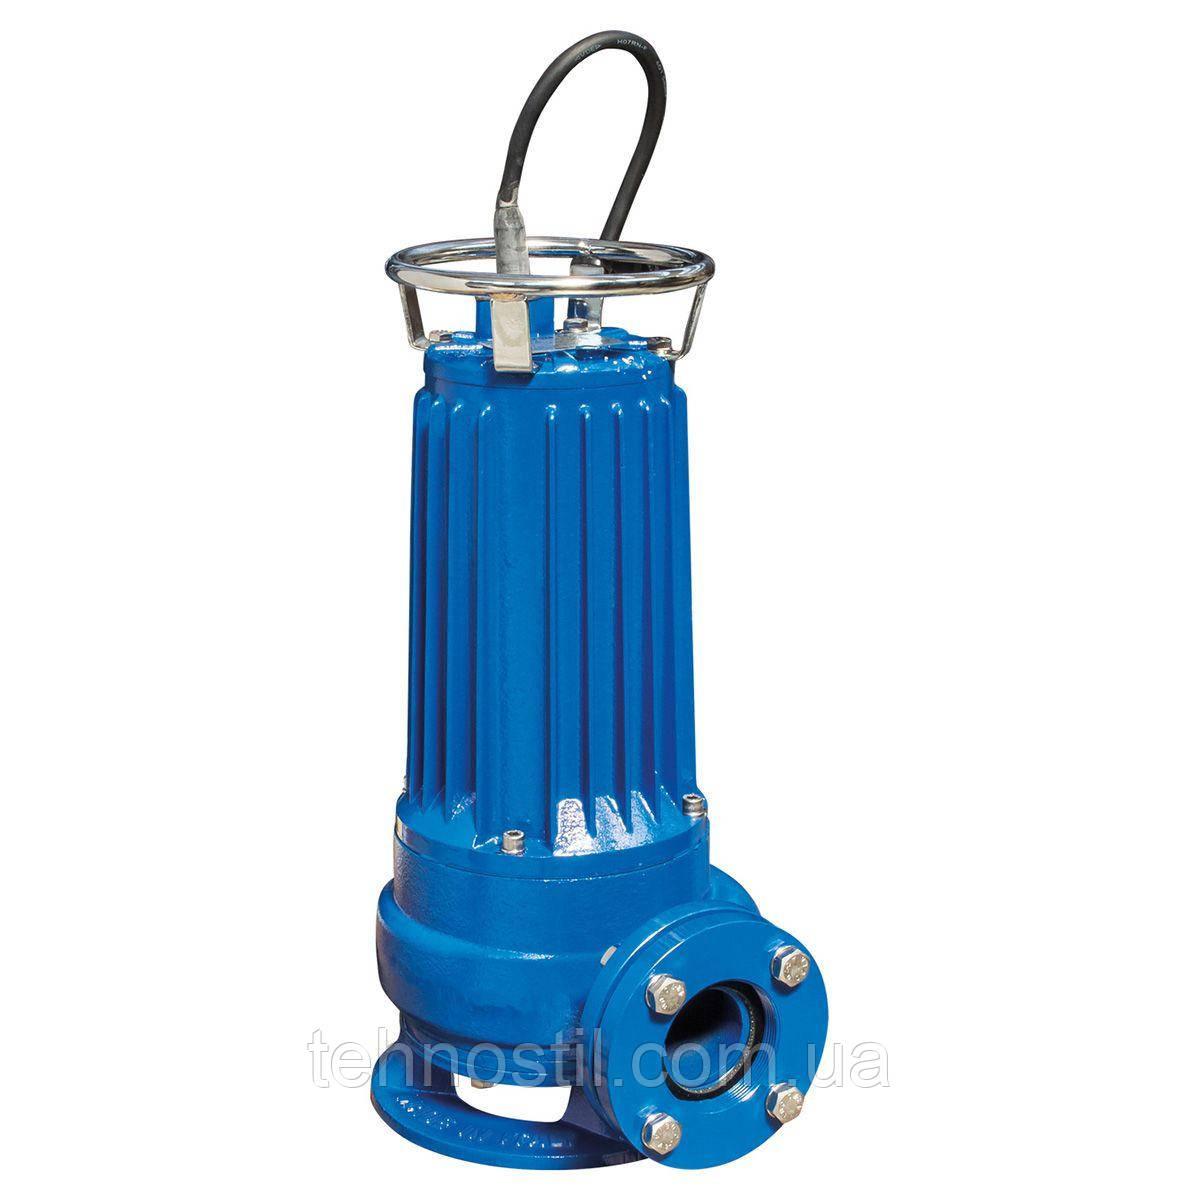 Speroni SQ 50-4 Насос канализационный (60 м³, 20 м, 4 кВт)